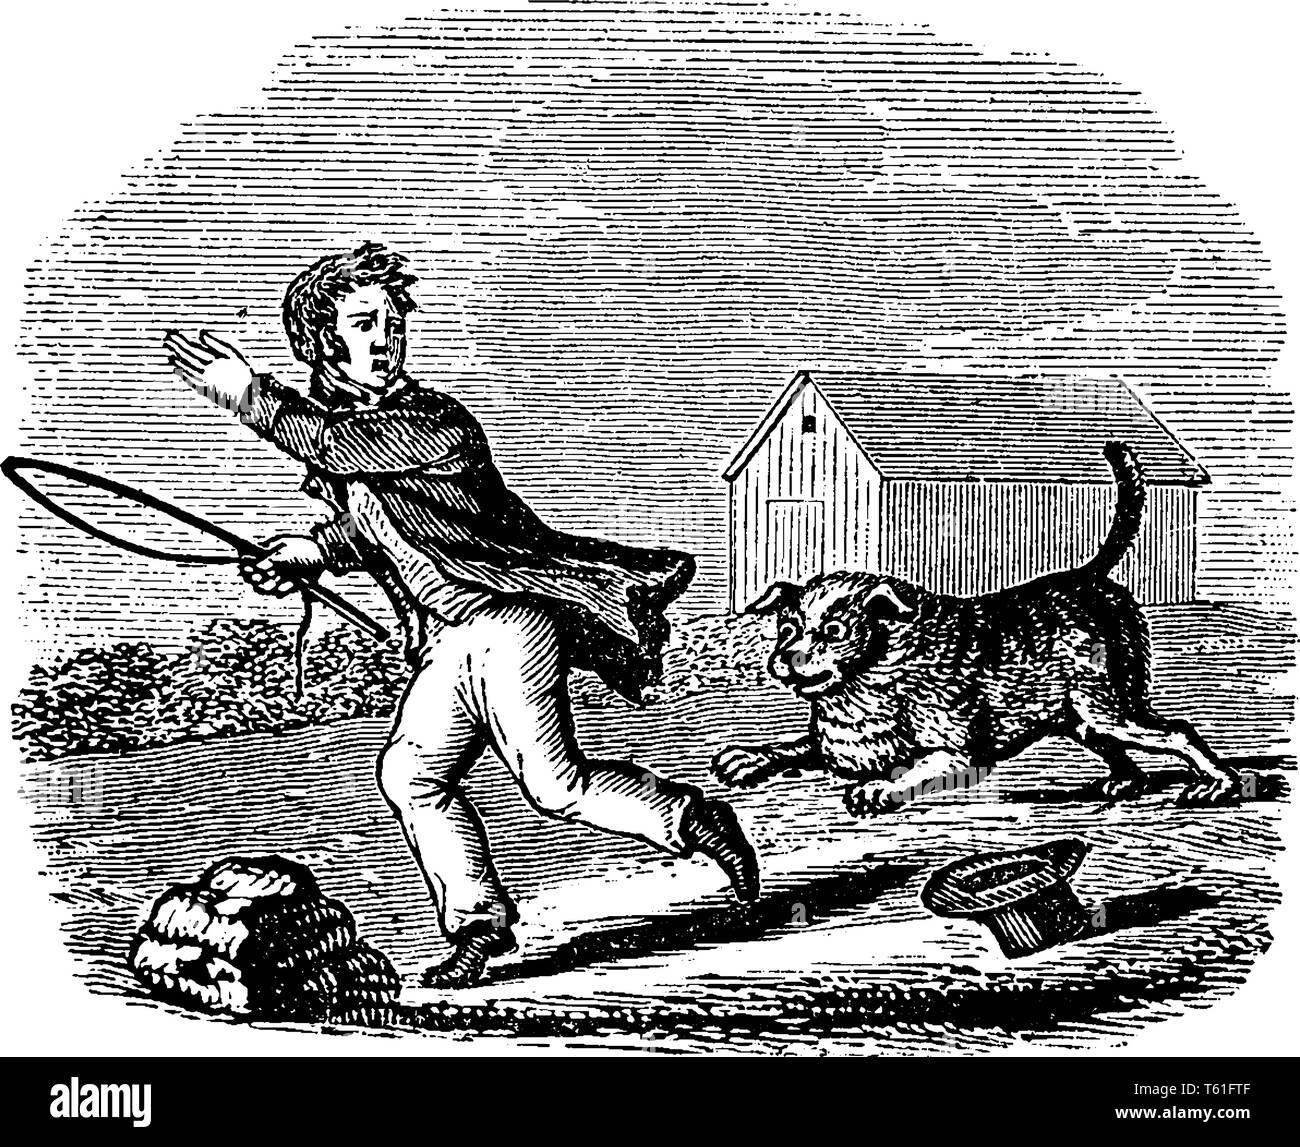 A dog running behind boy, vintage line drawing or engraving illustration - Stock Vector